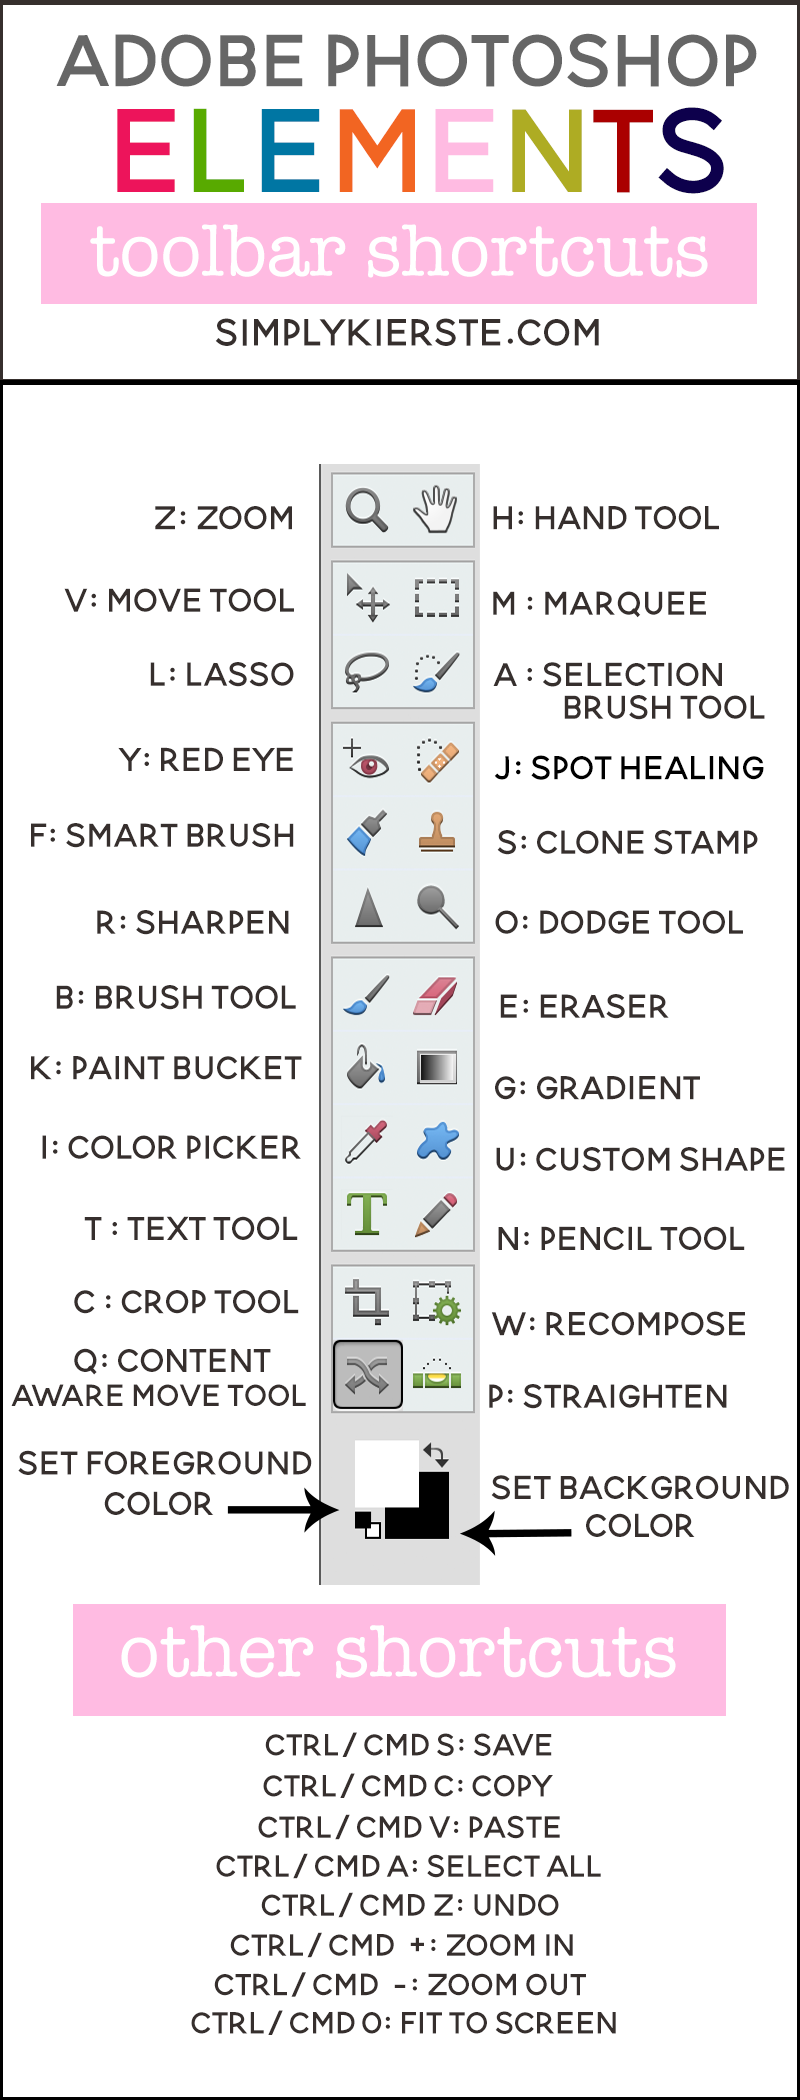 Adobe Photoshop Elements Shortcuts & Cheat Sheet